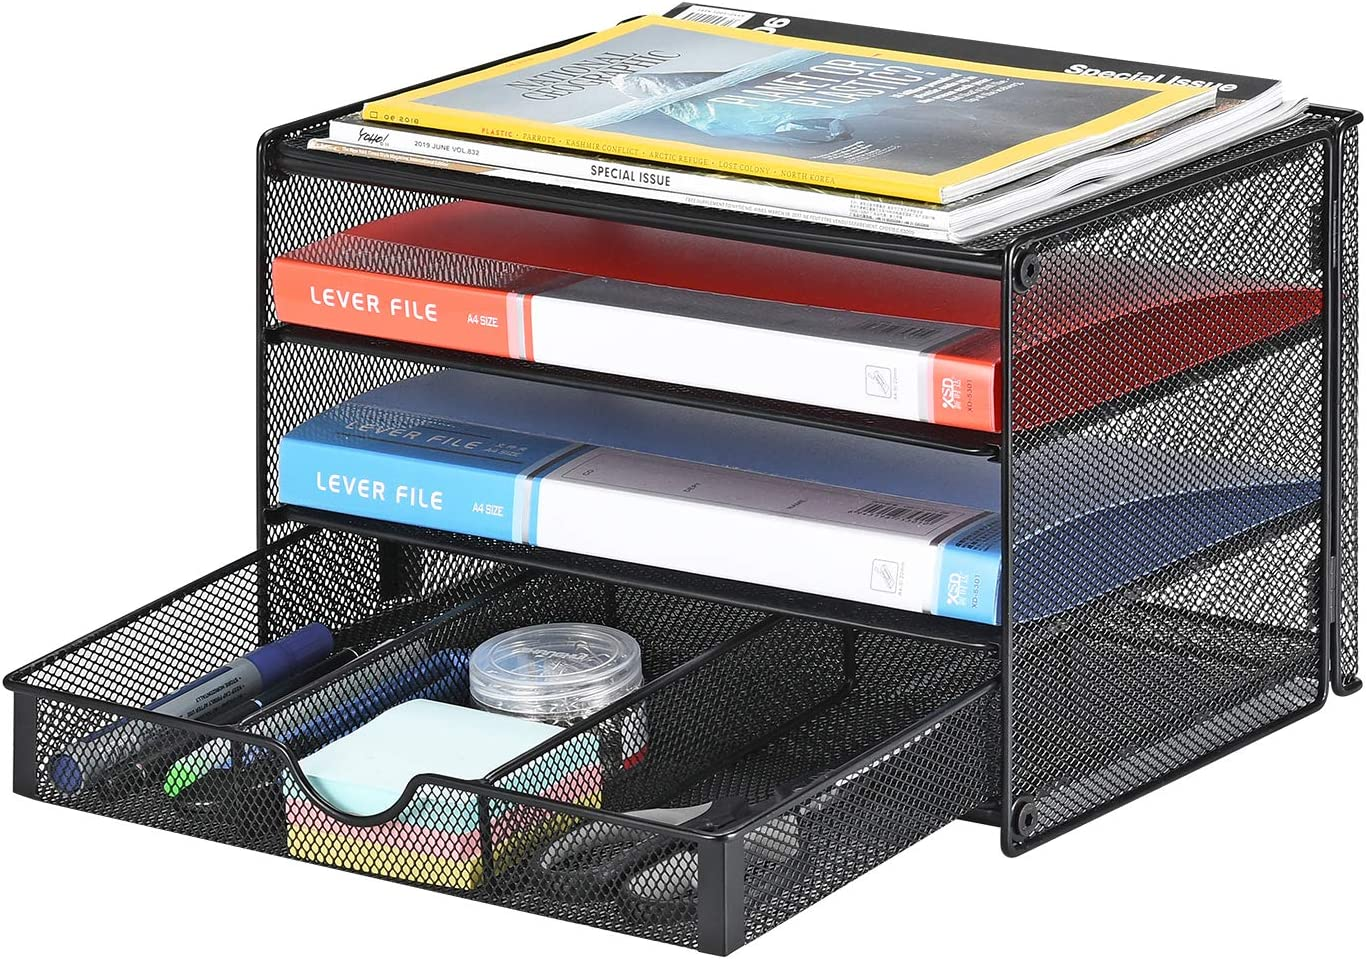 Samstar Paper Letter Tray, 48 Tier Desk Document File Organizer Paper Sorter  Letter Shelf Rack with Extra Sliding Drawer, Mesh Made, Black